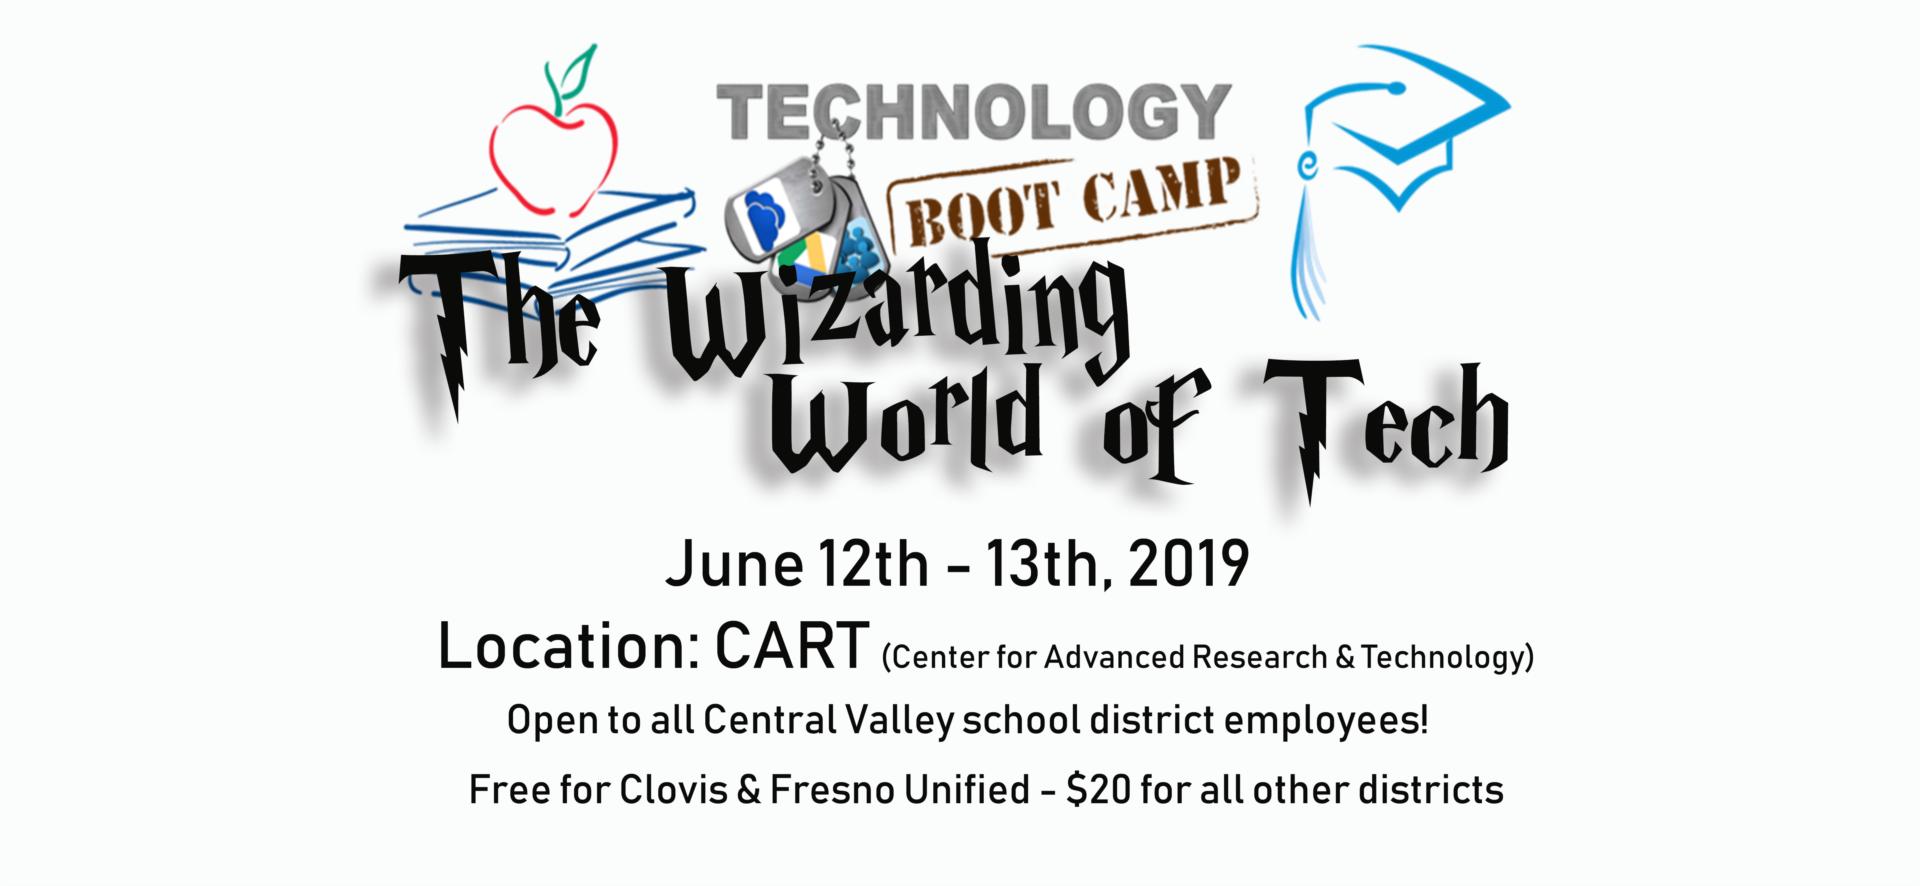 Bootcamp Invite June 12-13 Location CART